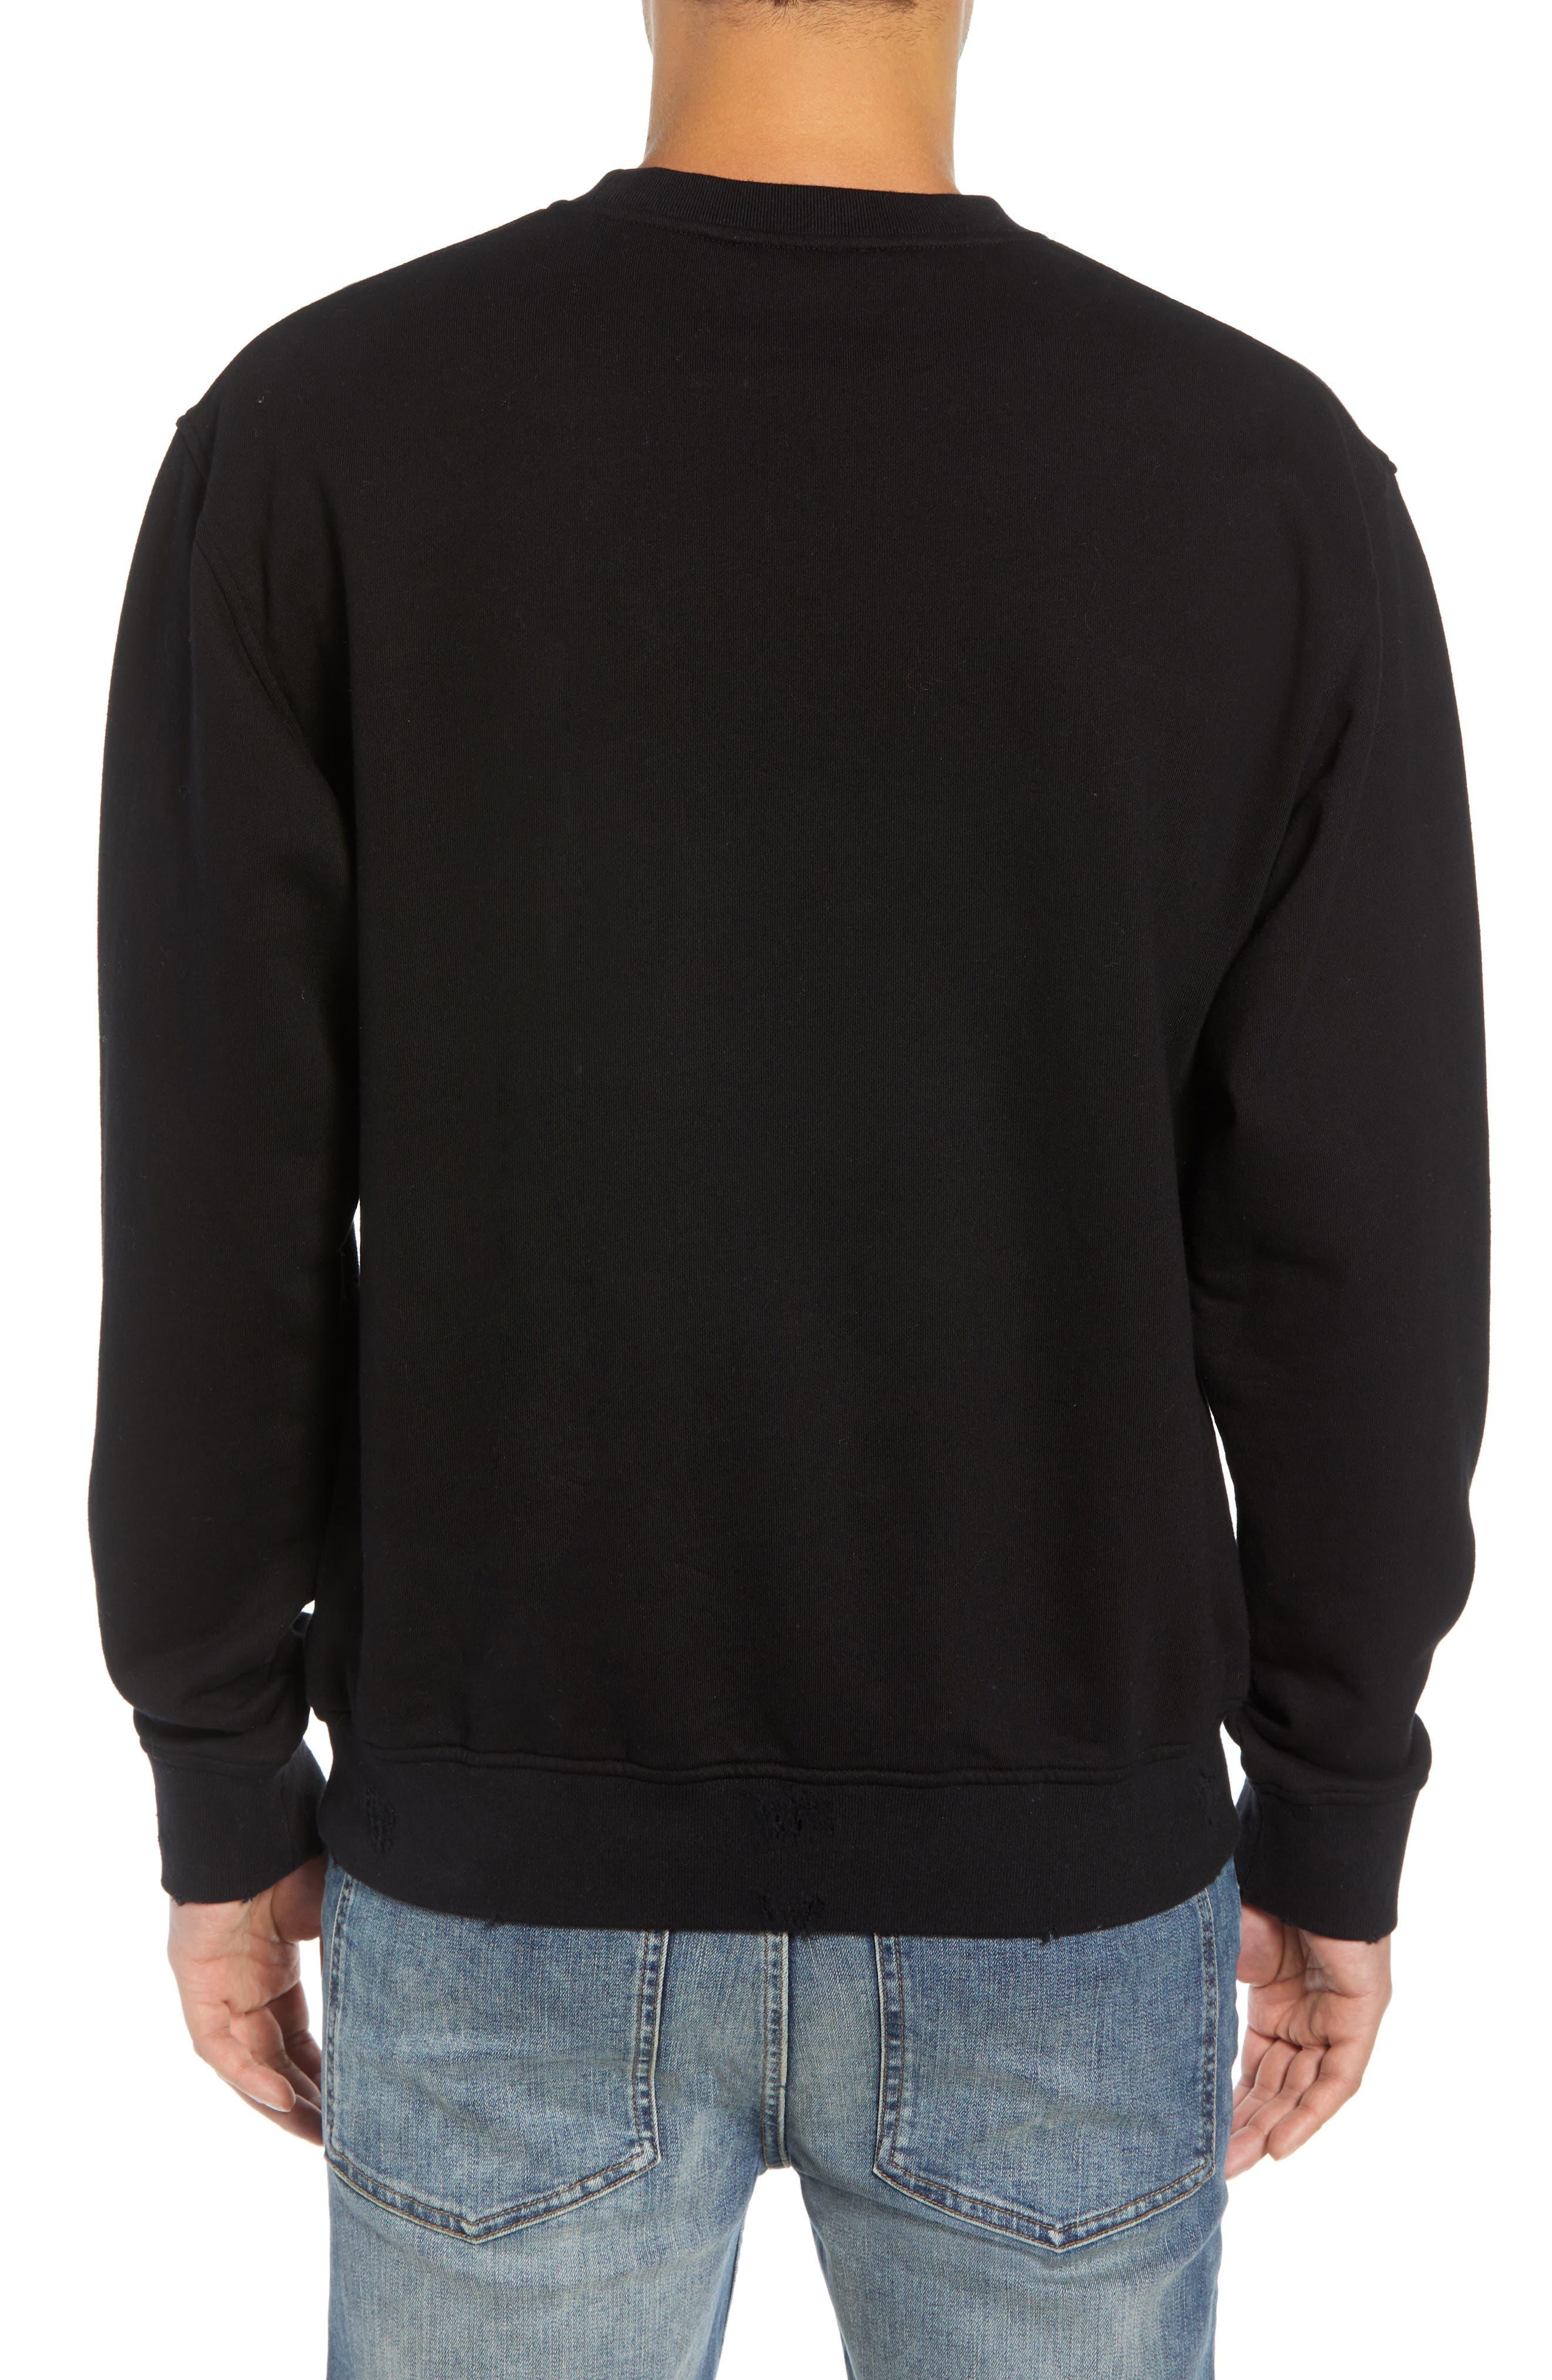 Nightmare Graphic Distressed Sweatshirt,                             Alternate thumbnail 2, color,                             BLACK